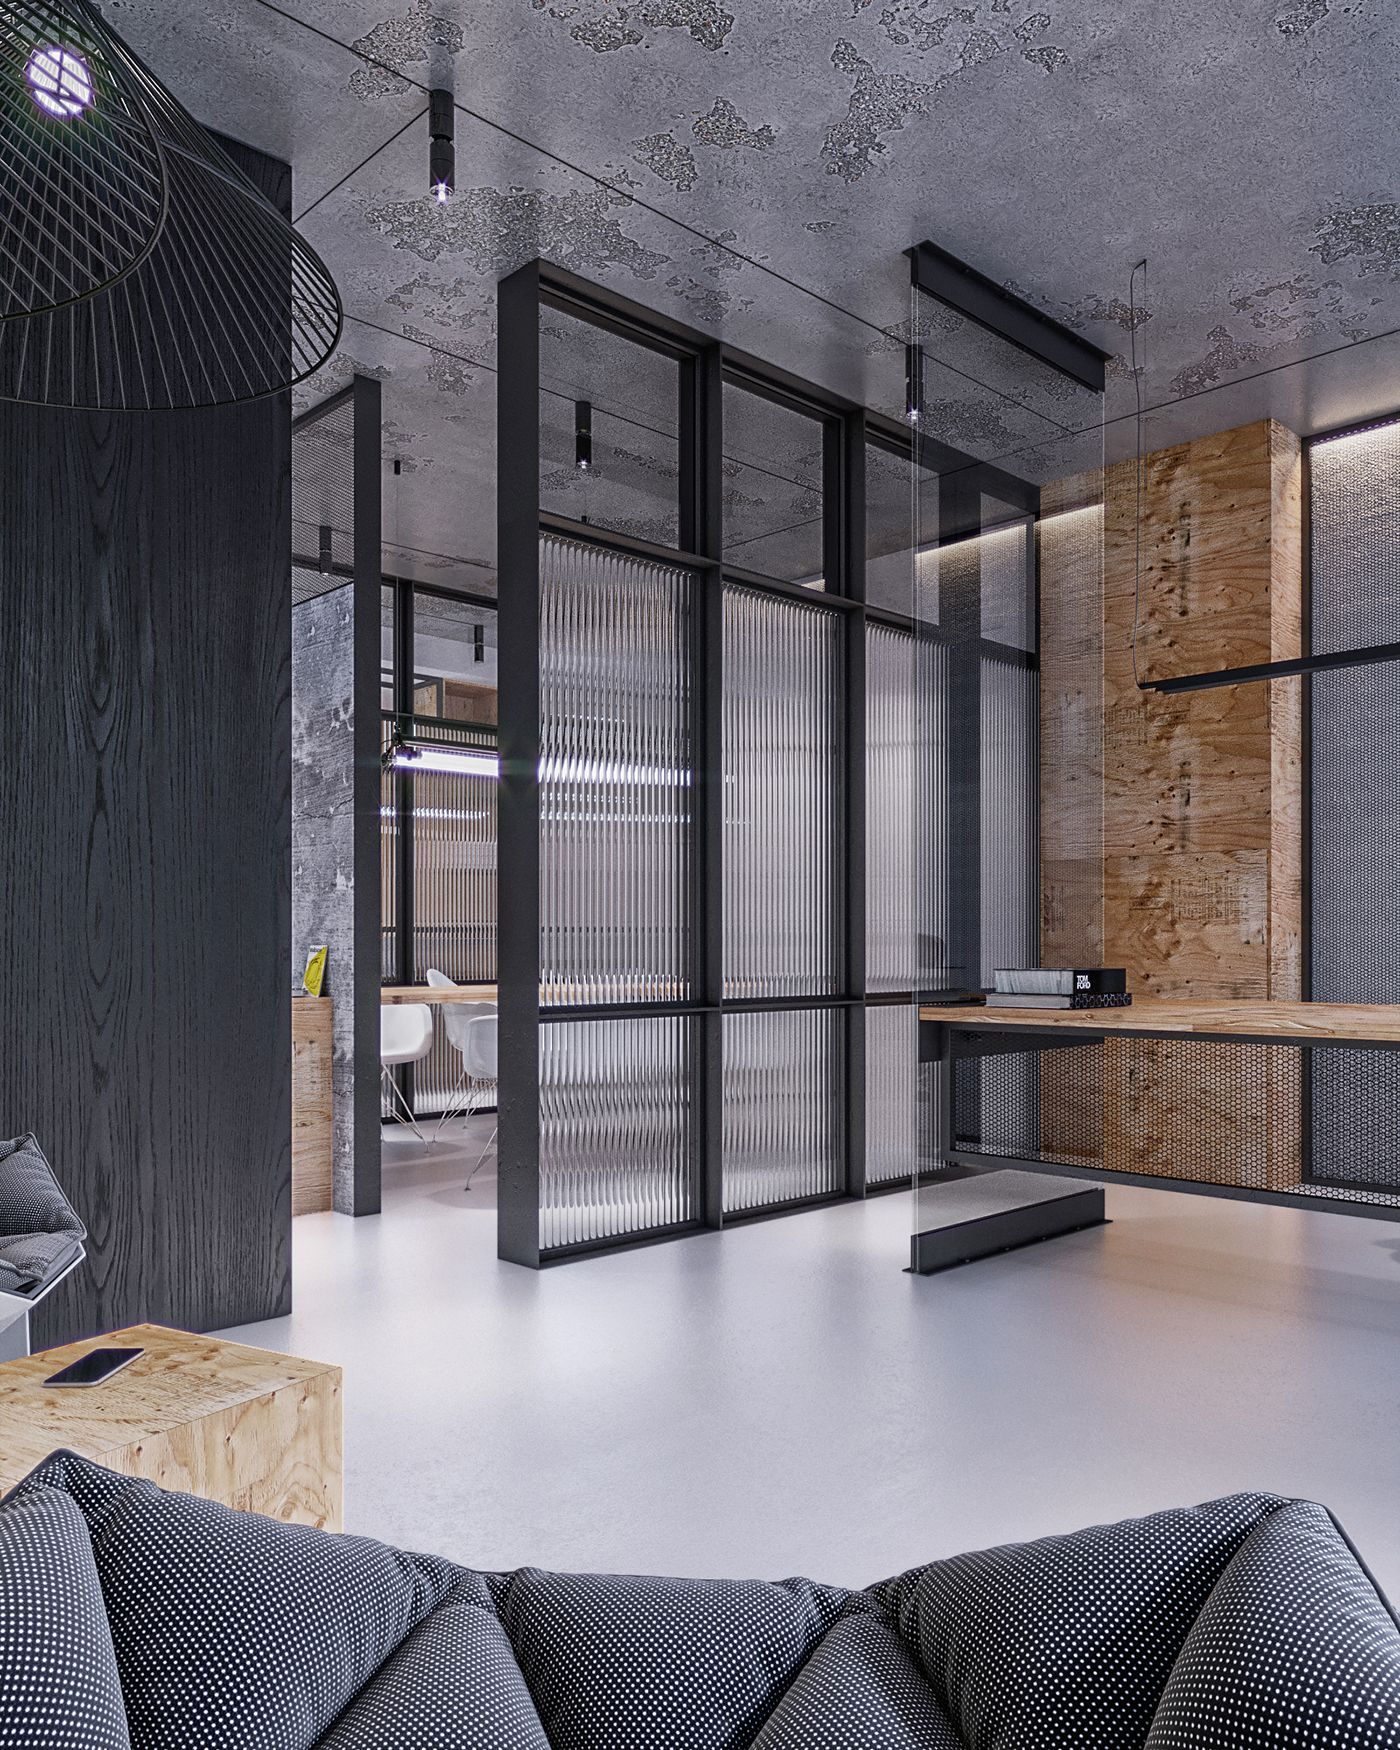 Small Office Interior Design: Industrial Office Studio On Behance